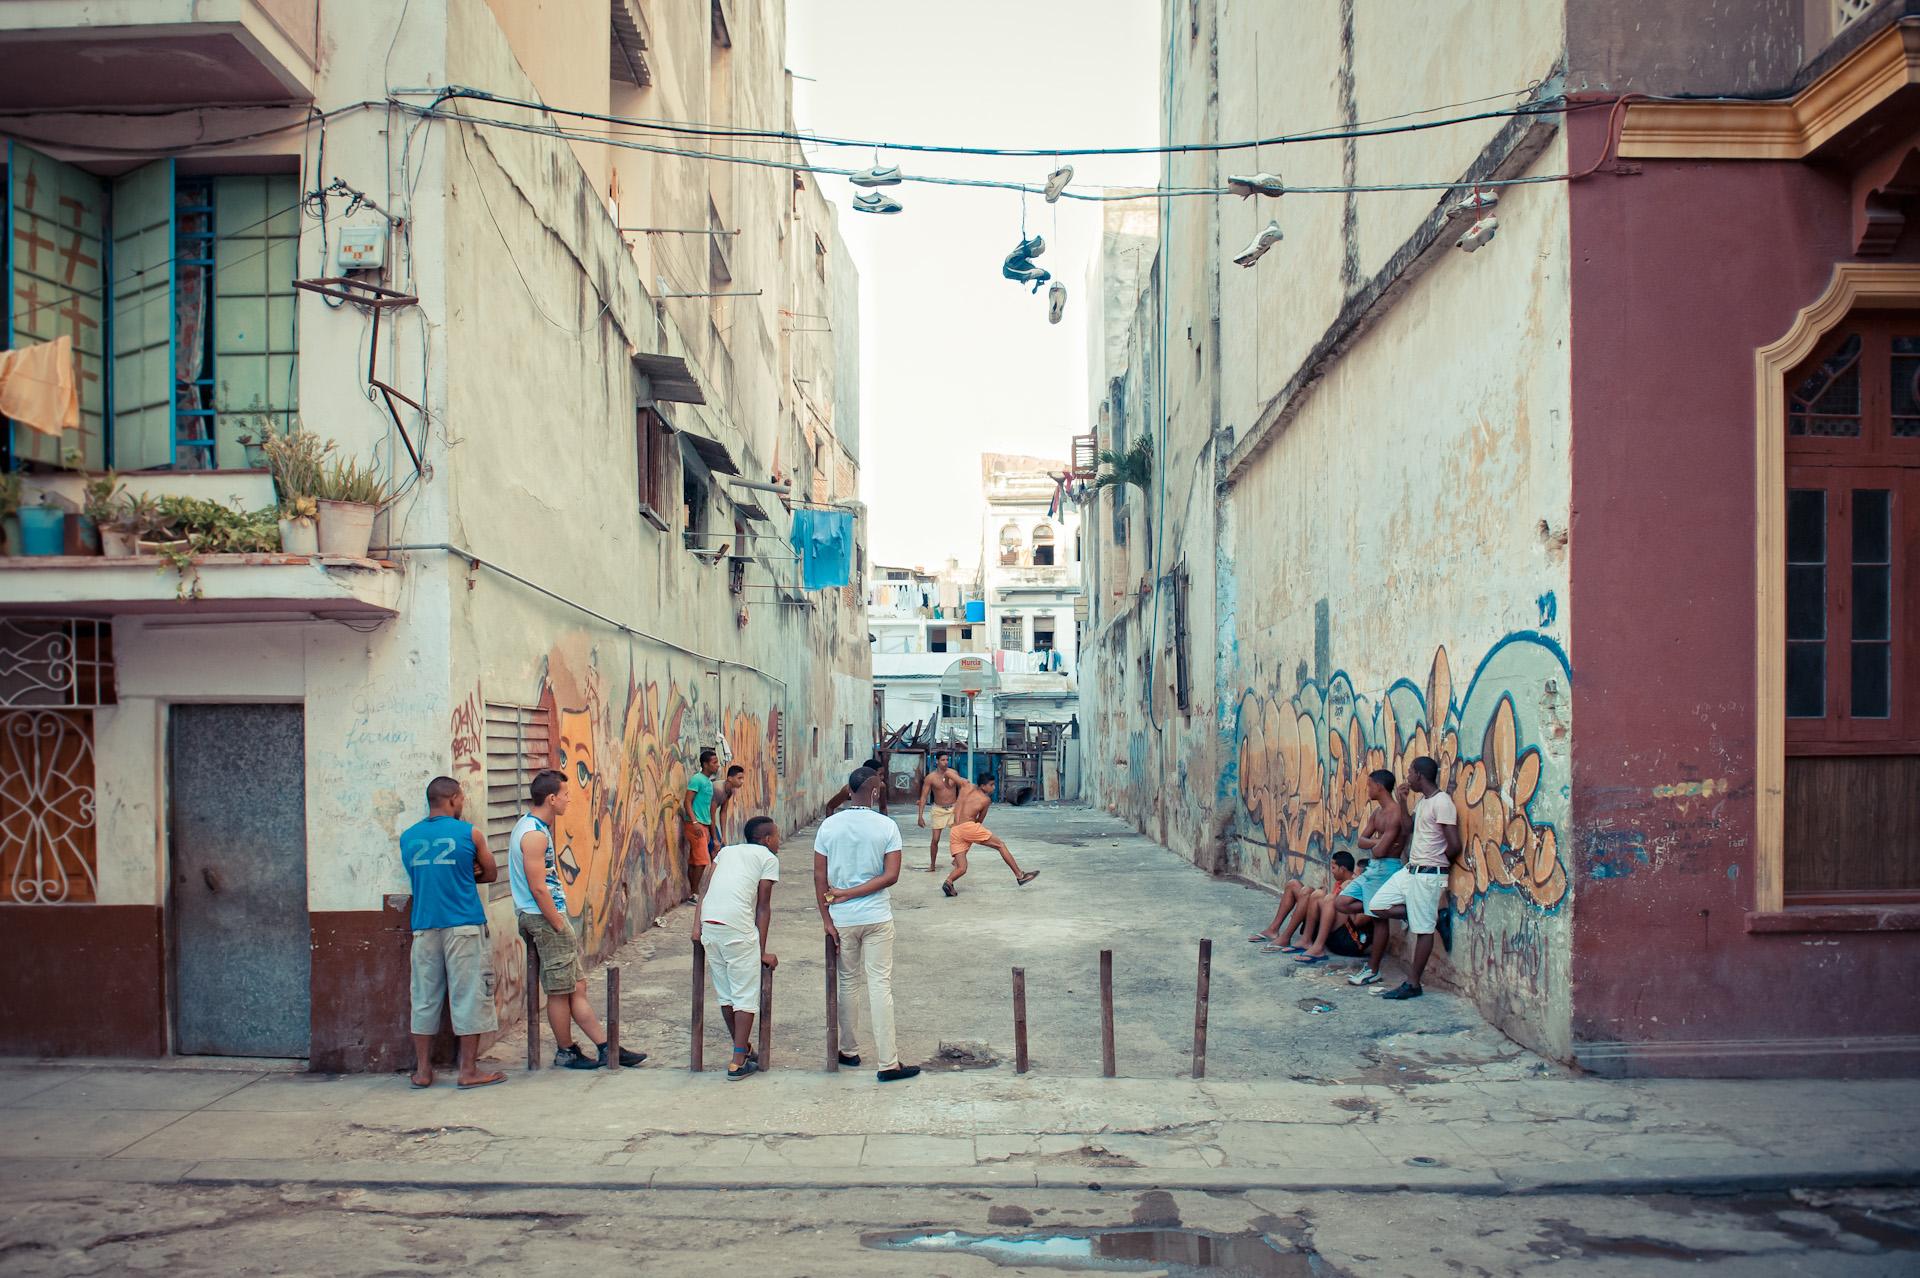 Cuba-Havana-Travel-Street-Scence-Game.JPG